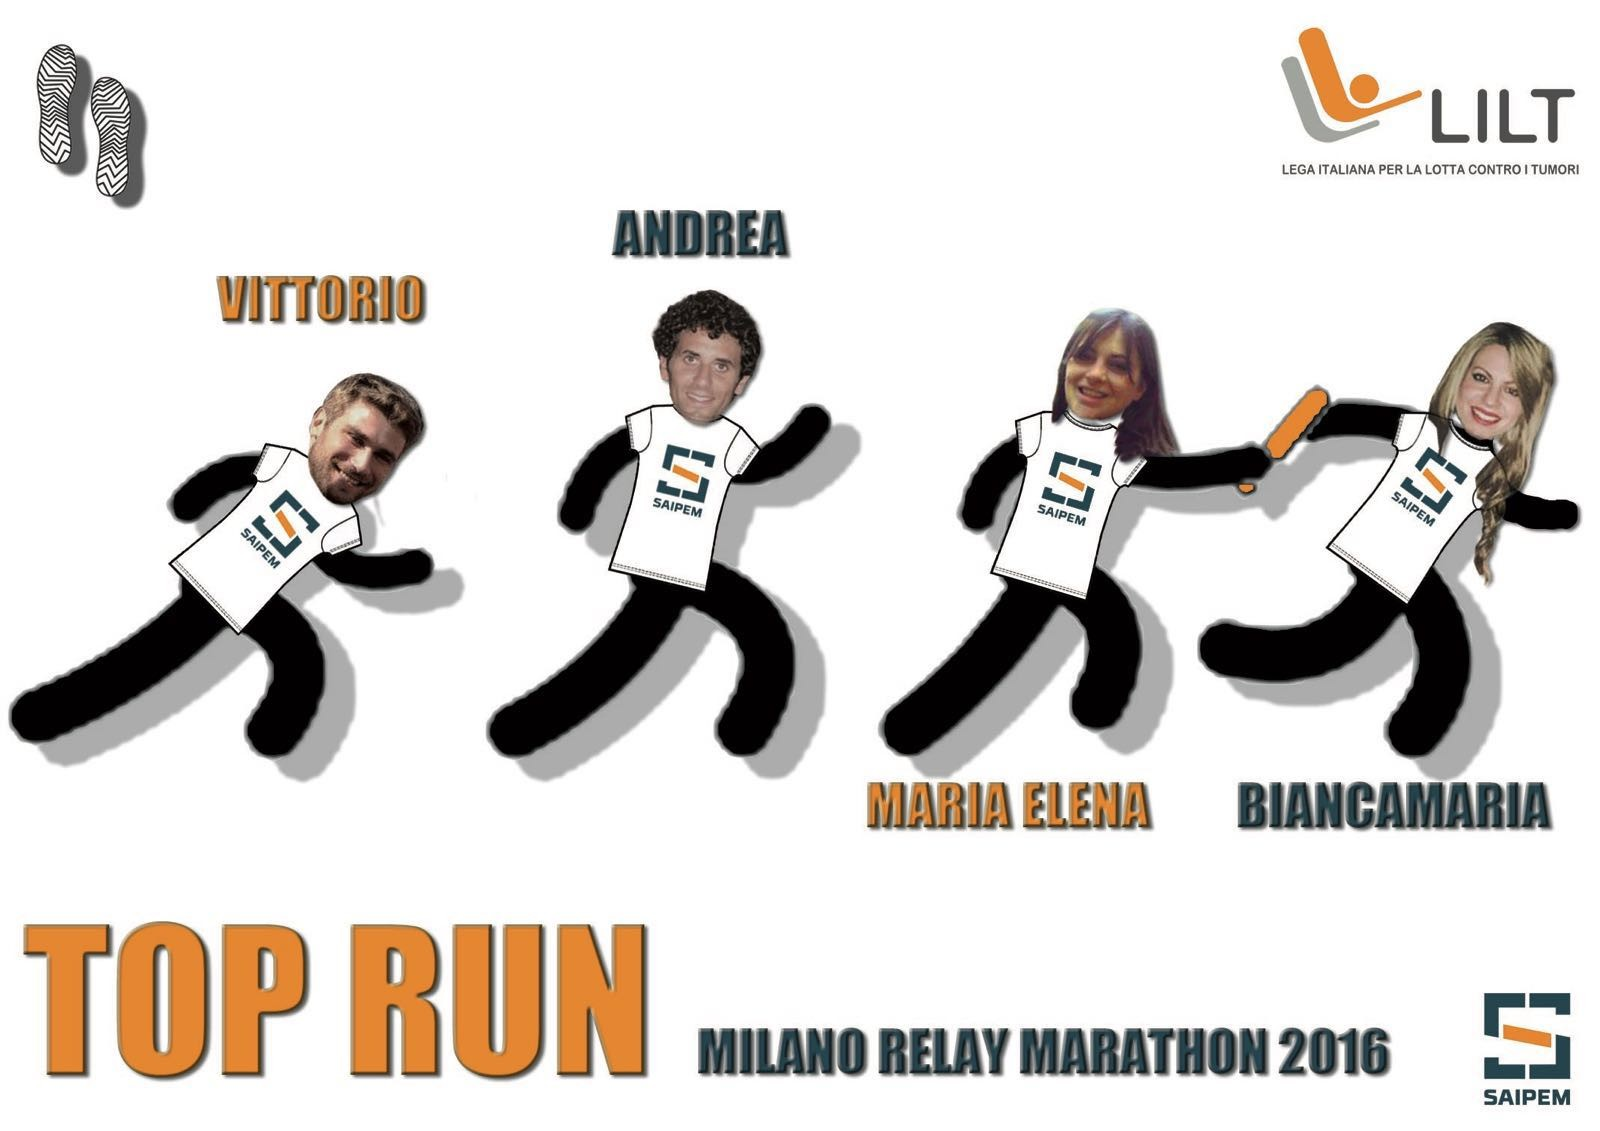 TOP RUN - FONDLHS-22-Vittorio, Maria Elena,  Andrea e Biancamaria